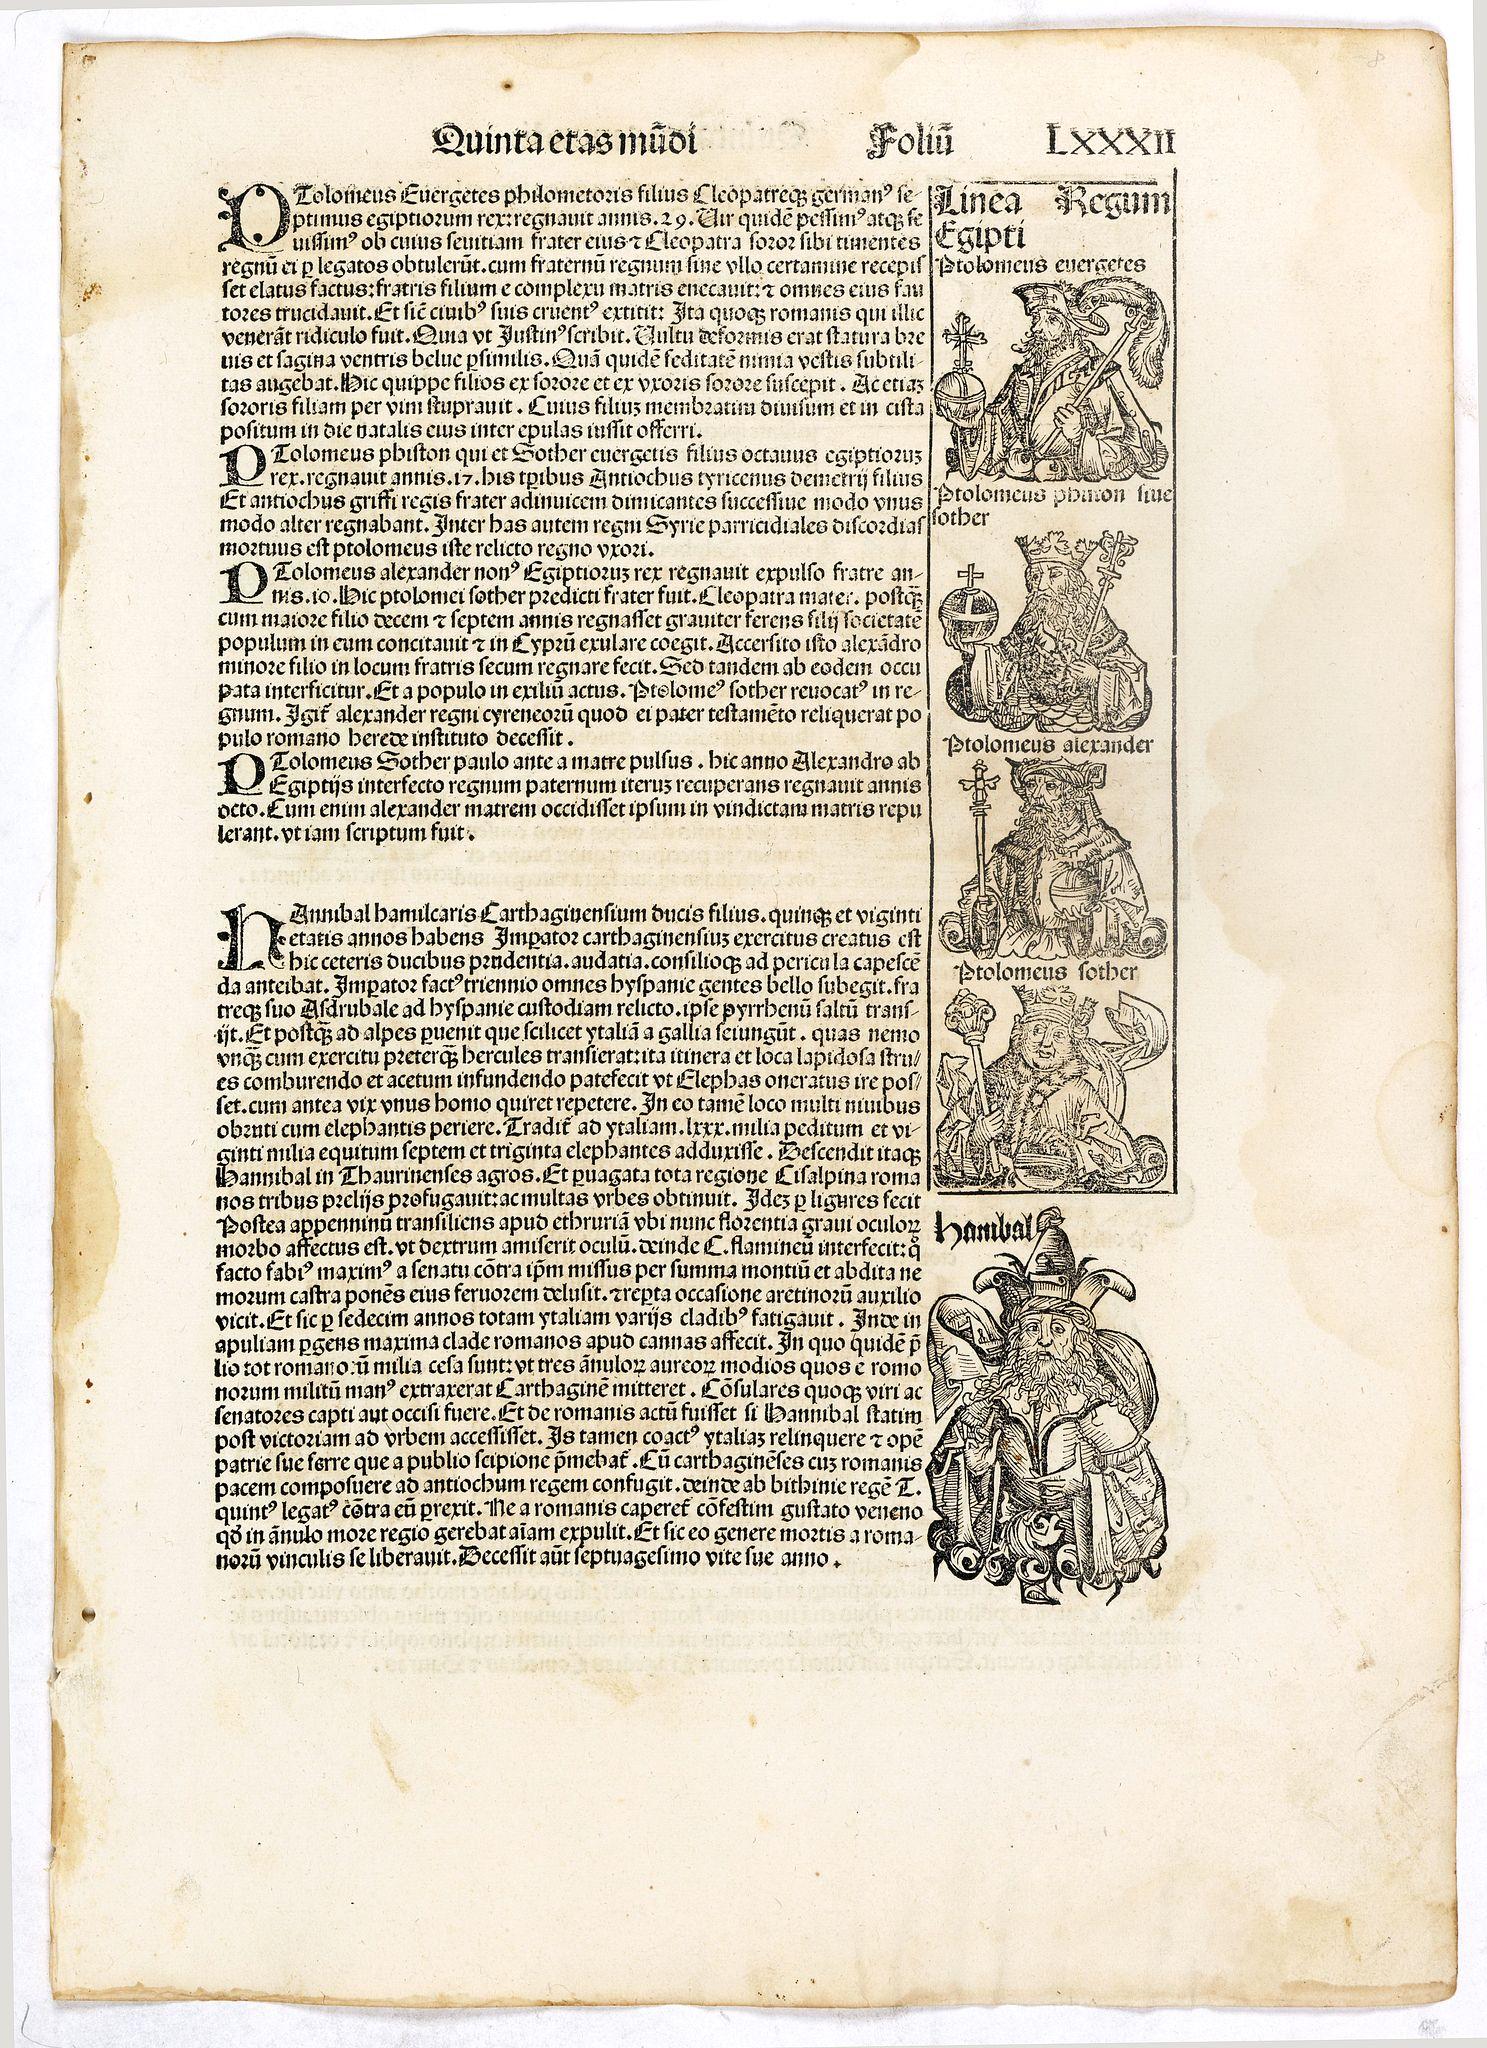 SCHEDEL, H. -  Quinta Etas Mundi. Folium. LXXXII